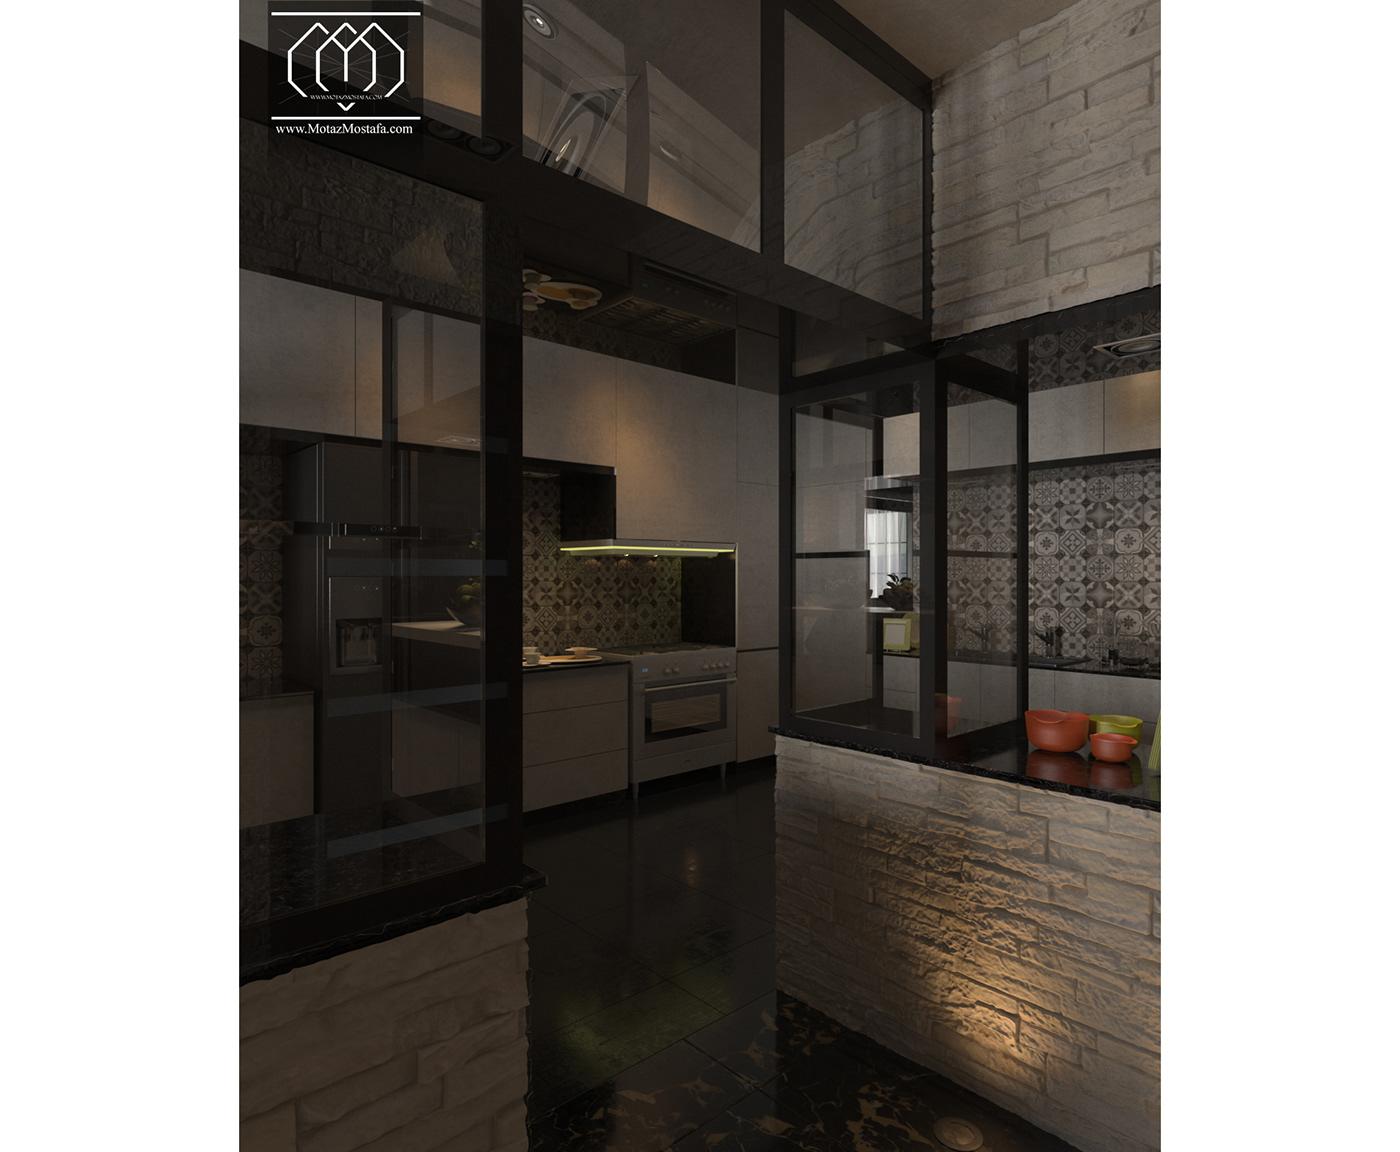 Arhictecure 3dsmax vray photoshop Interior design visualization graphics modern Motaz mostafa